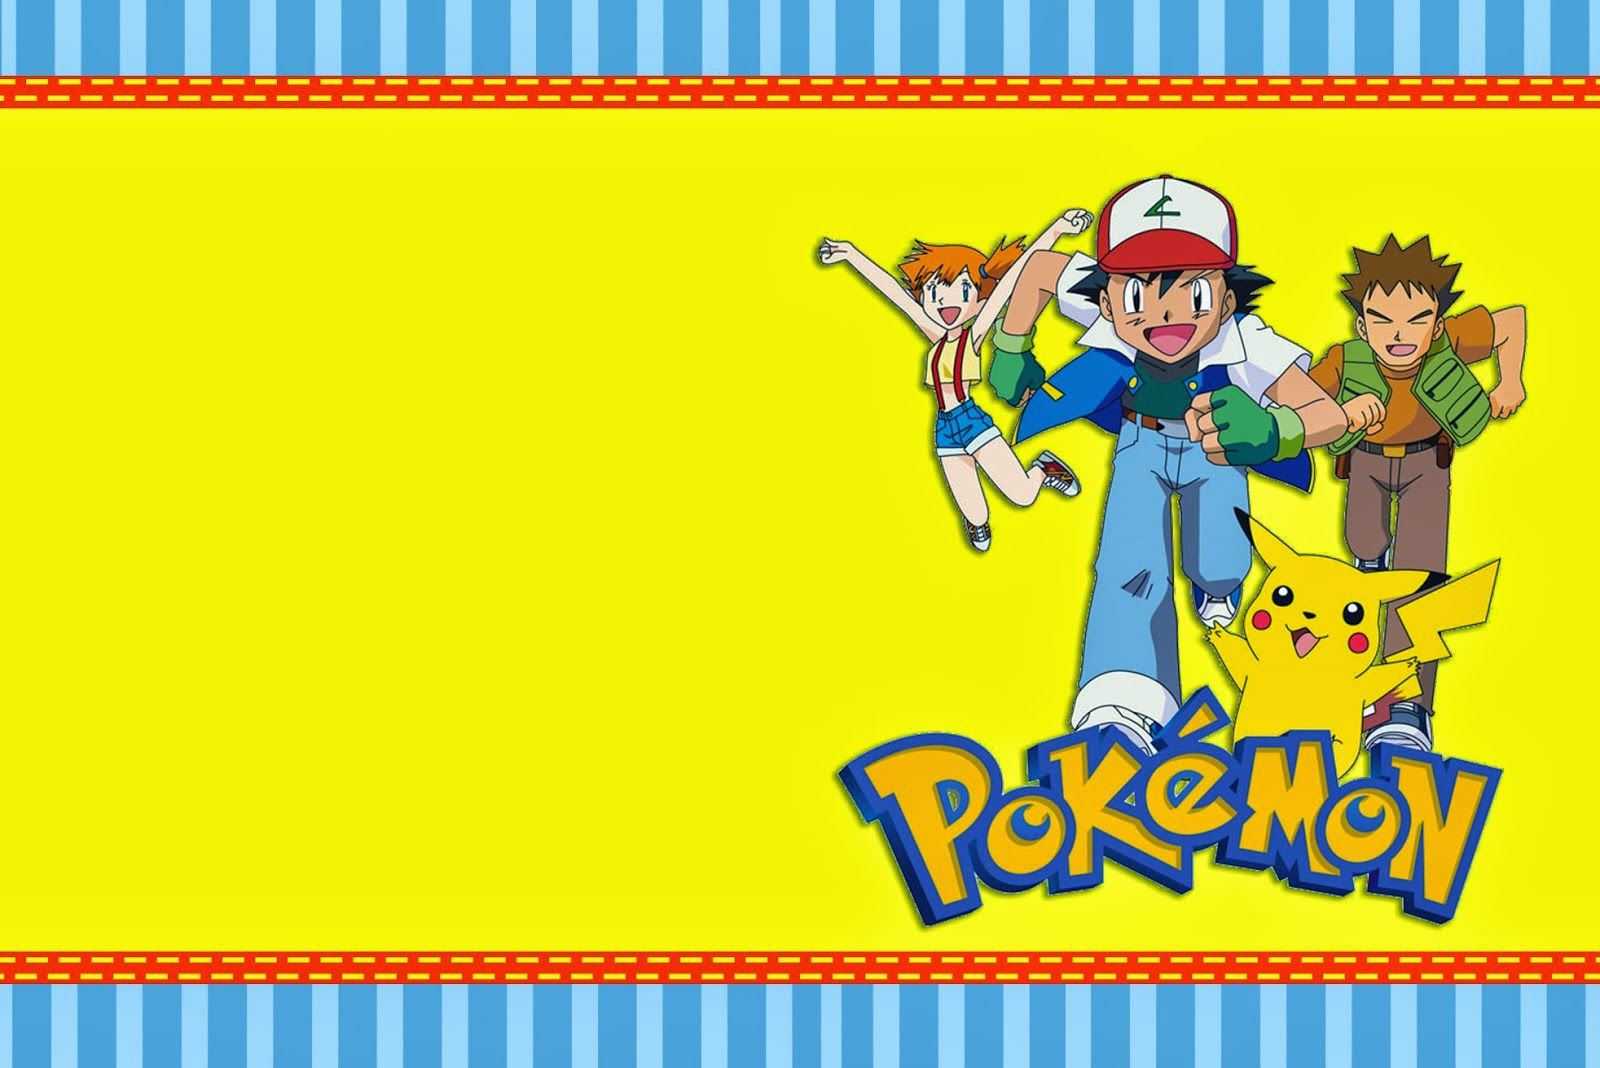 Pokemon Invitaciones Para Imprimir Gratis Pokemon Invitations Pokemon Birthday Pokemon Party Invitations